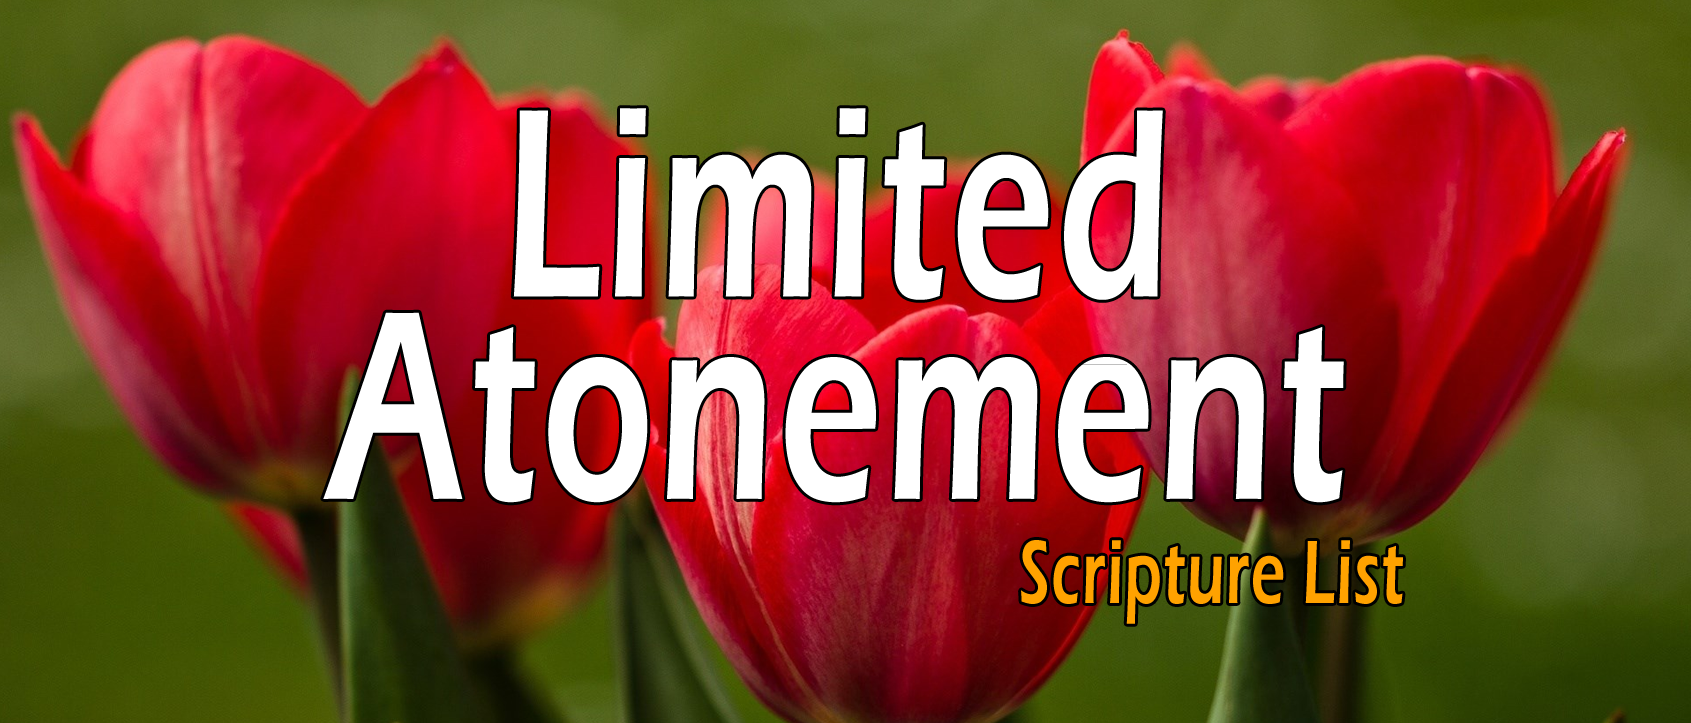 Limited Atonement, Definite Redemption - Scripture List & Case